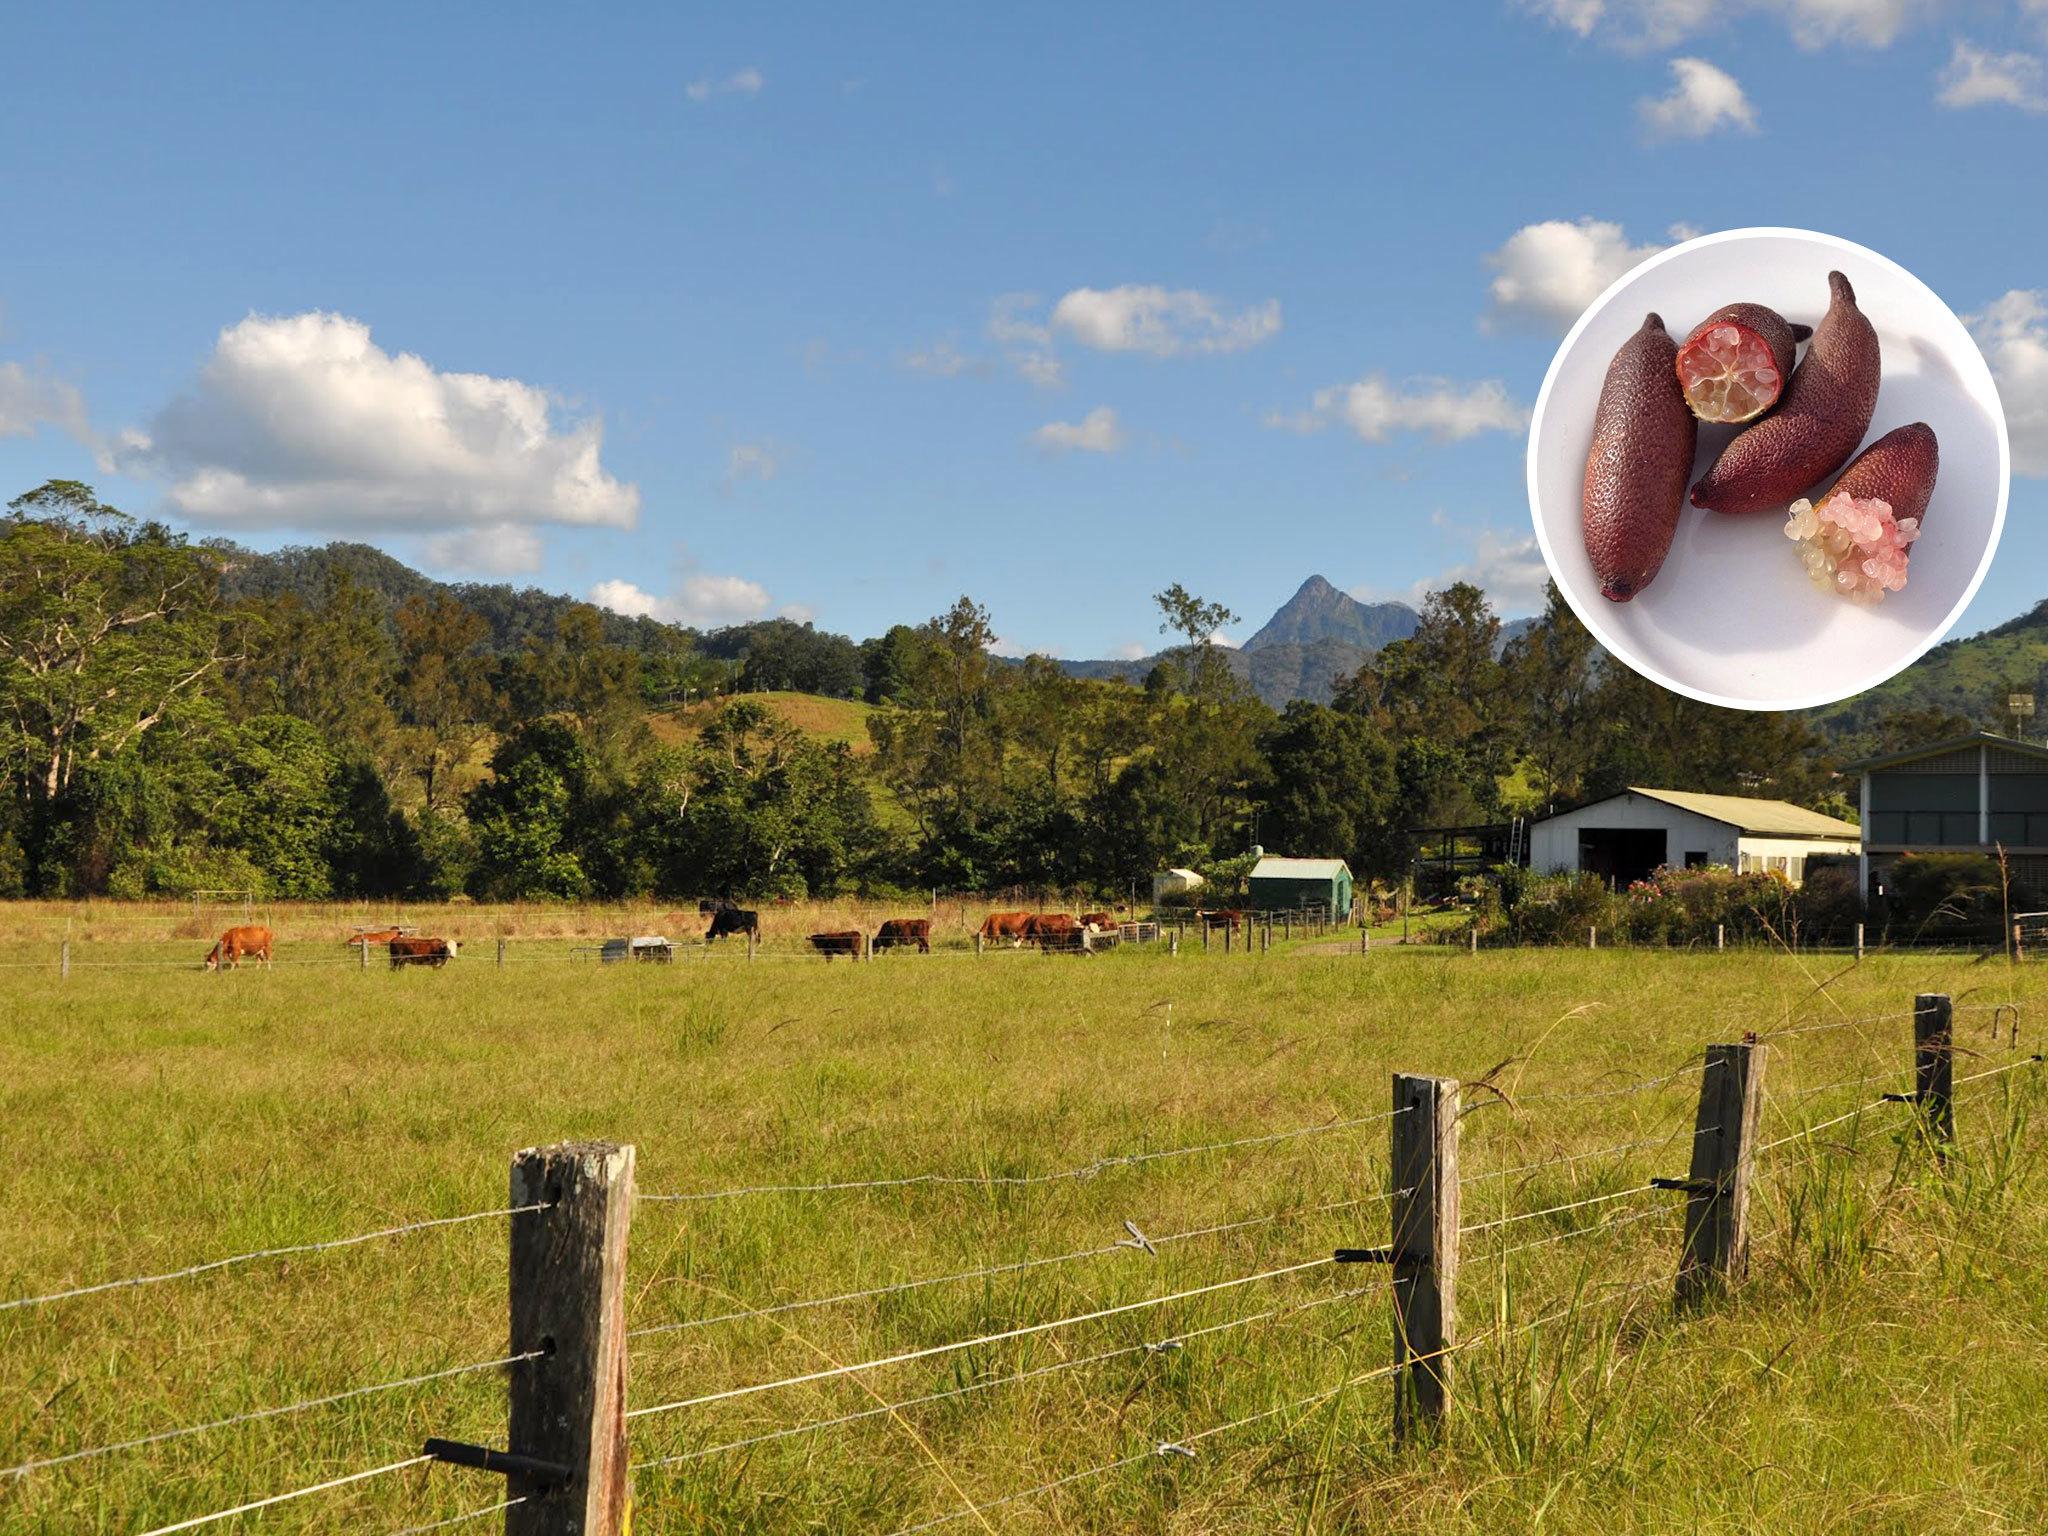 Australia on a plate - Finger limes